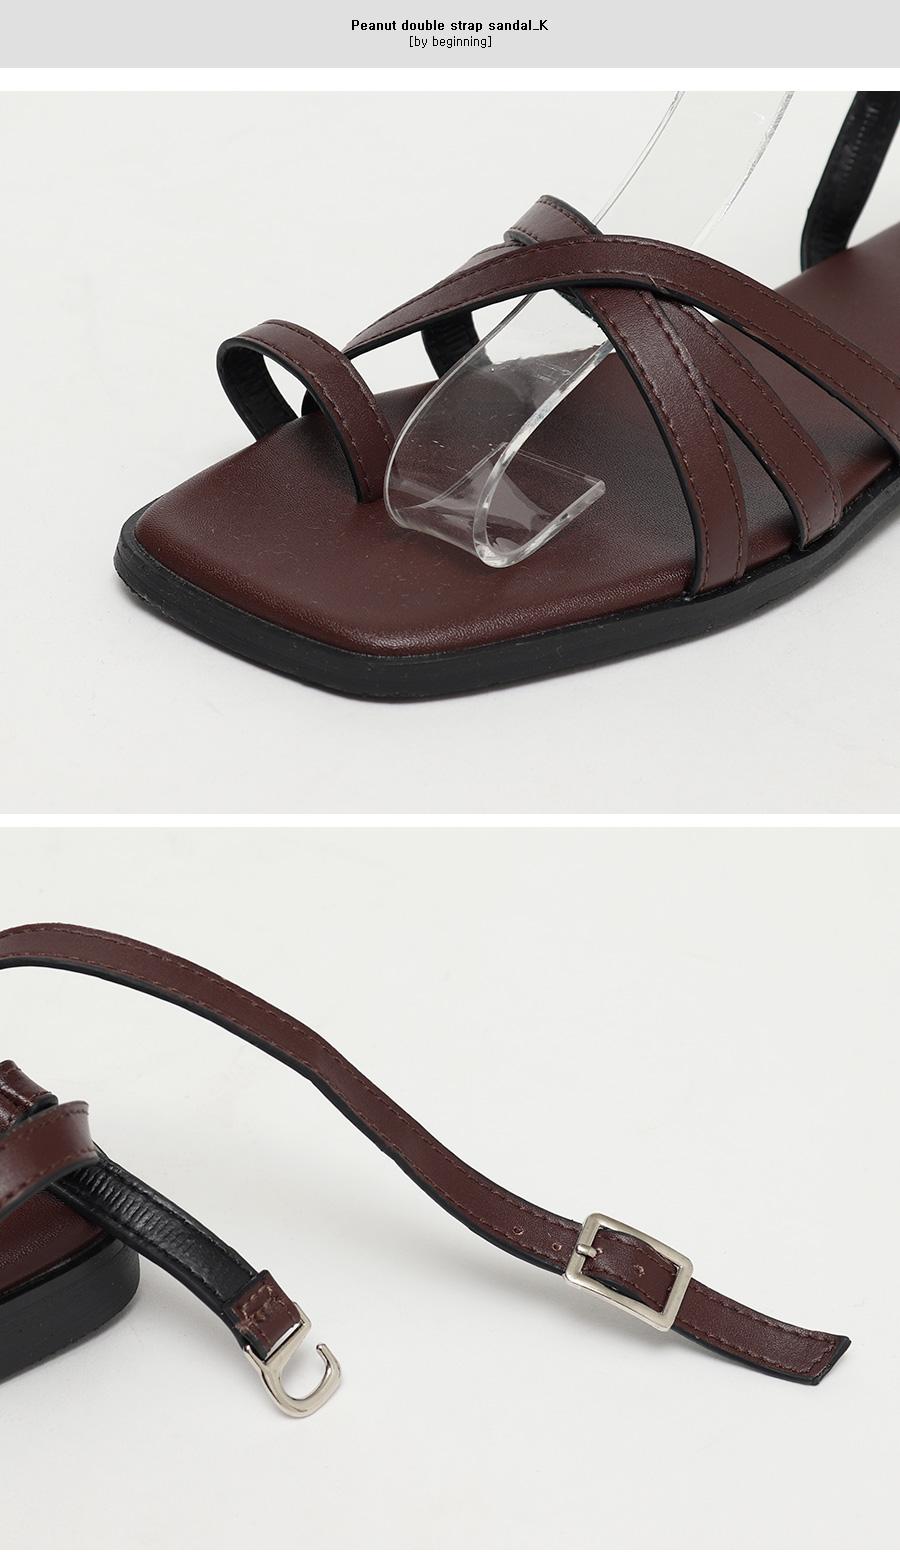 Peanut double strap sandal_K